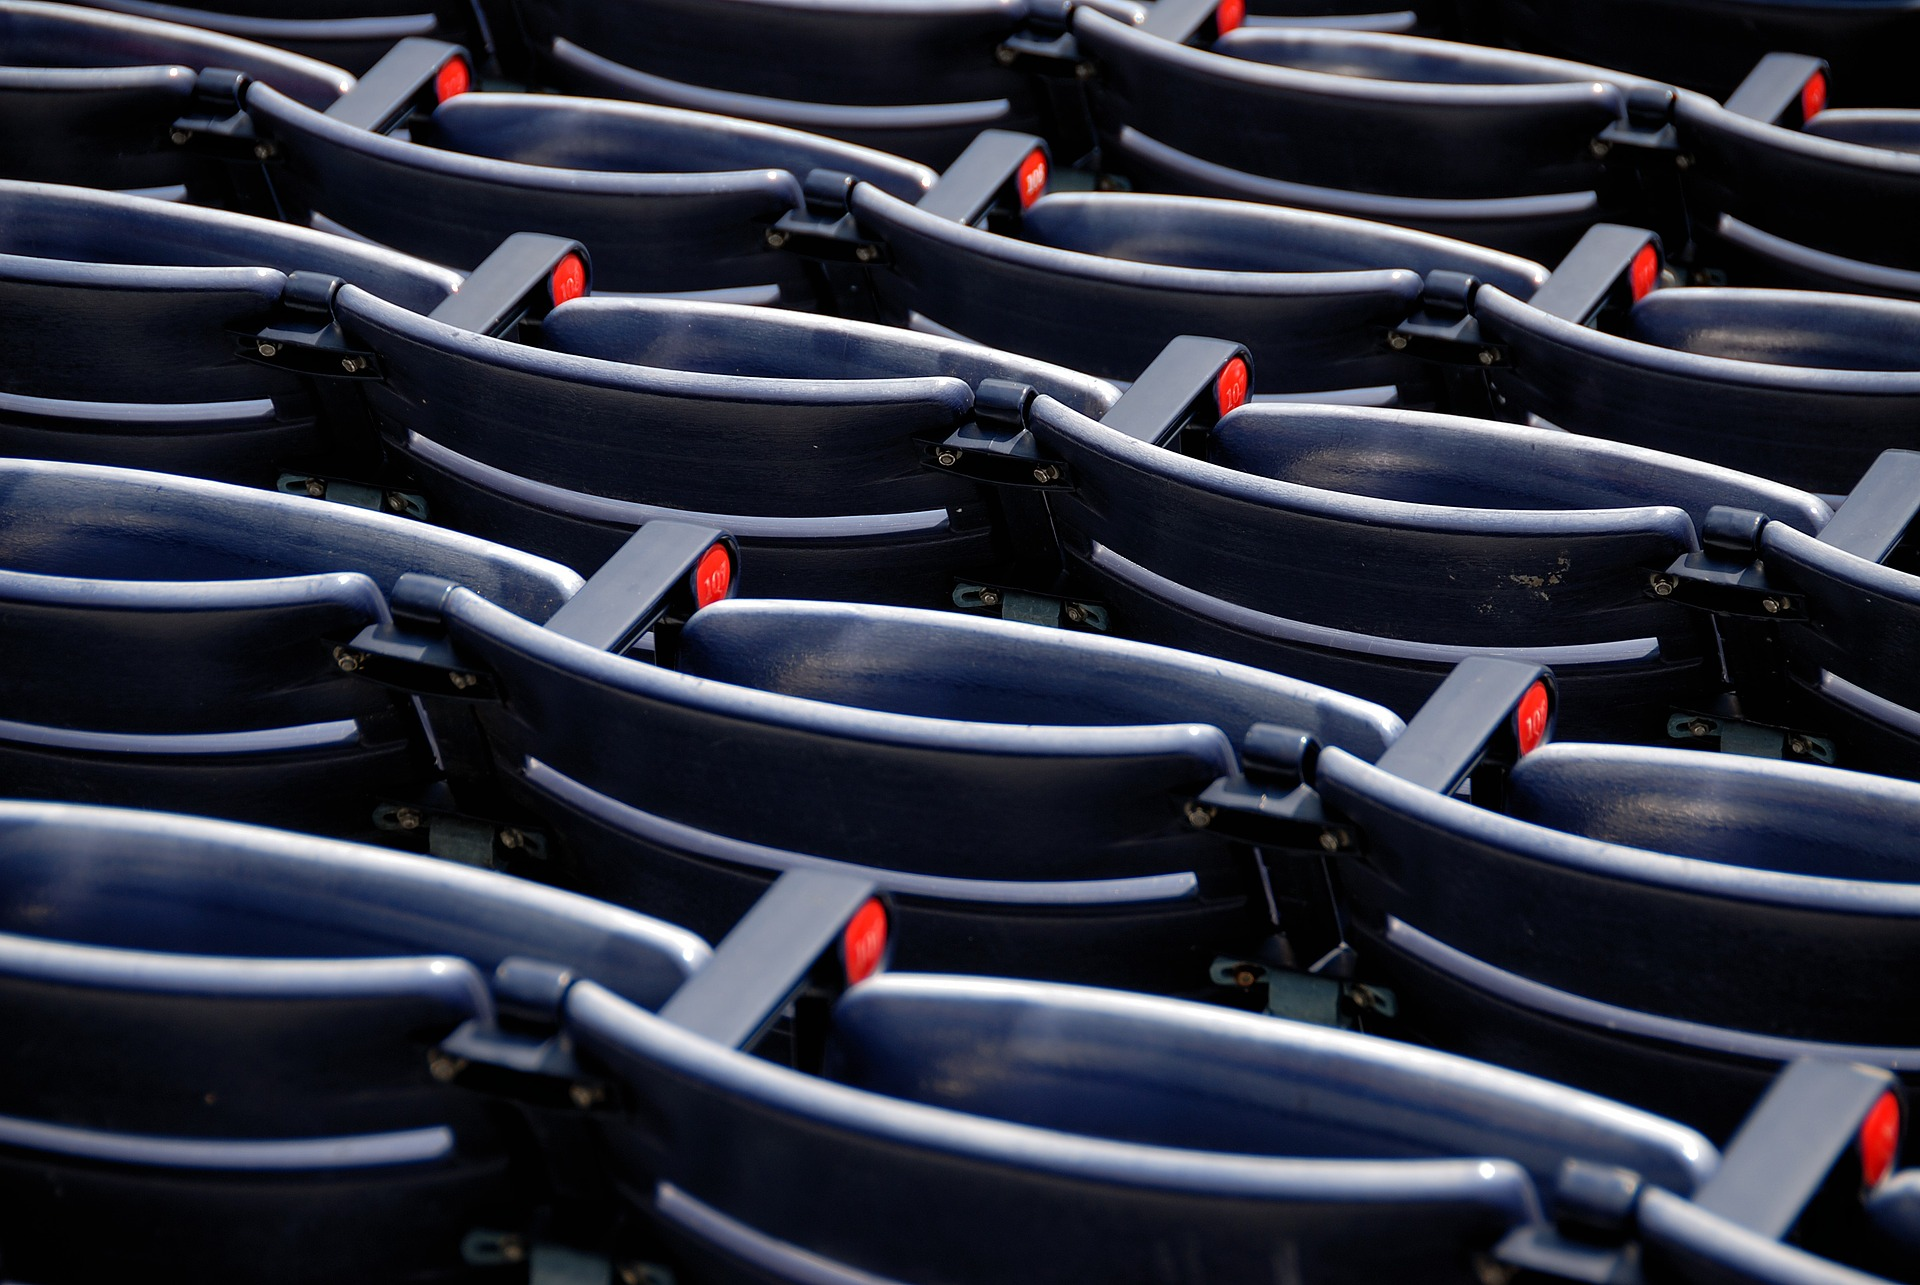 empty-stadium-seats-3038581_1920